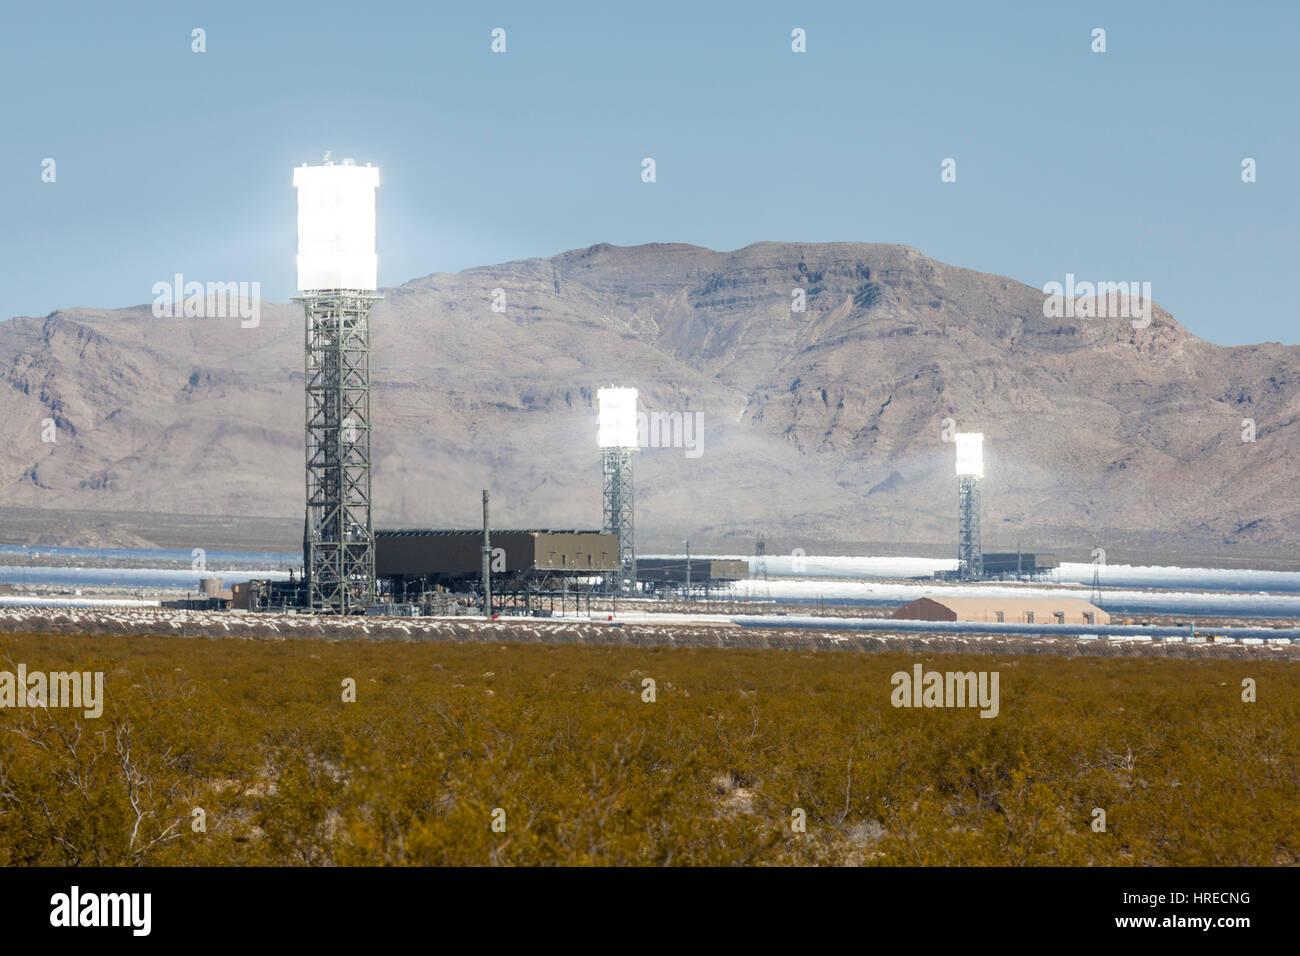 Ivanpah, California, USA - May 14, 2014:  White hot towers at the newly operational 392 megawatt Ivanpah solar thermal - Stock Image